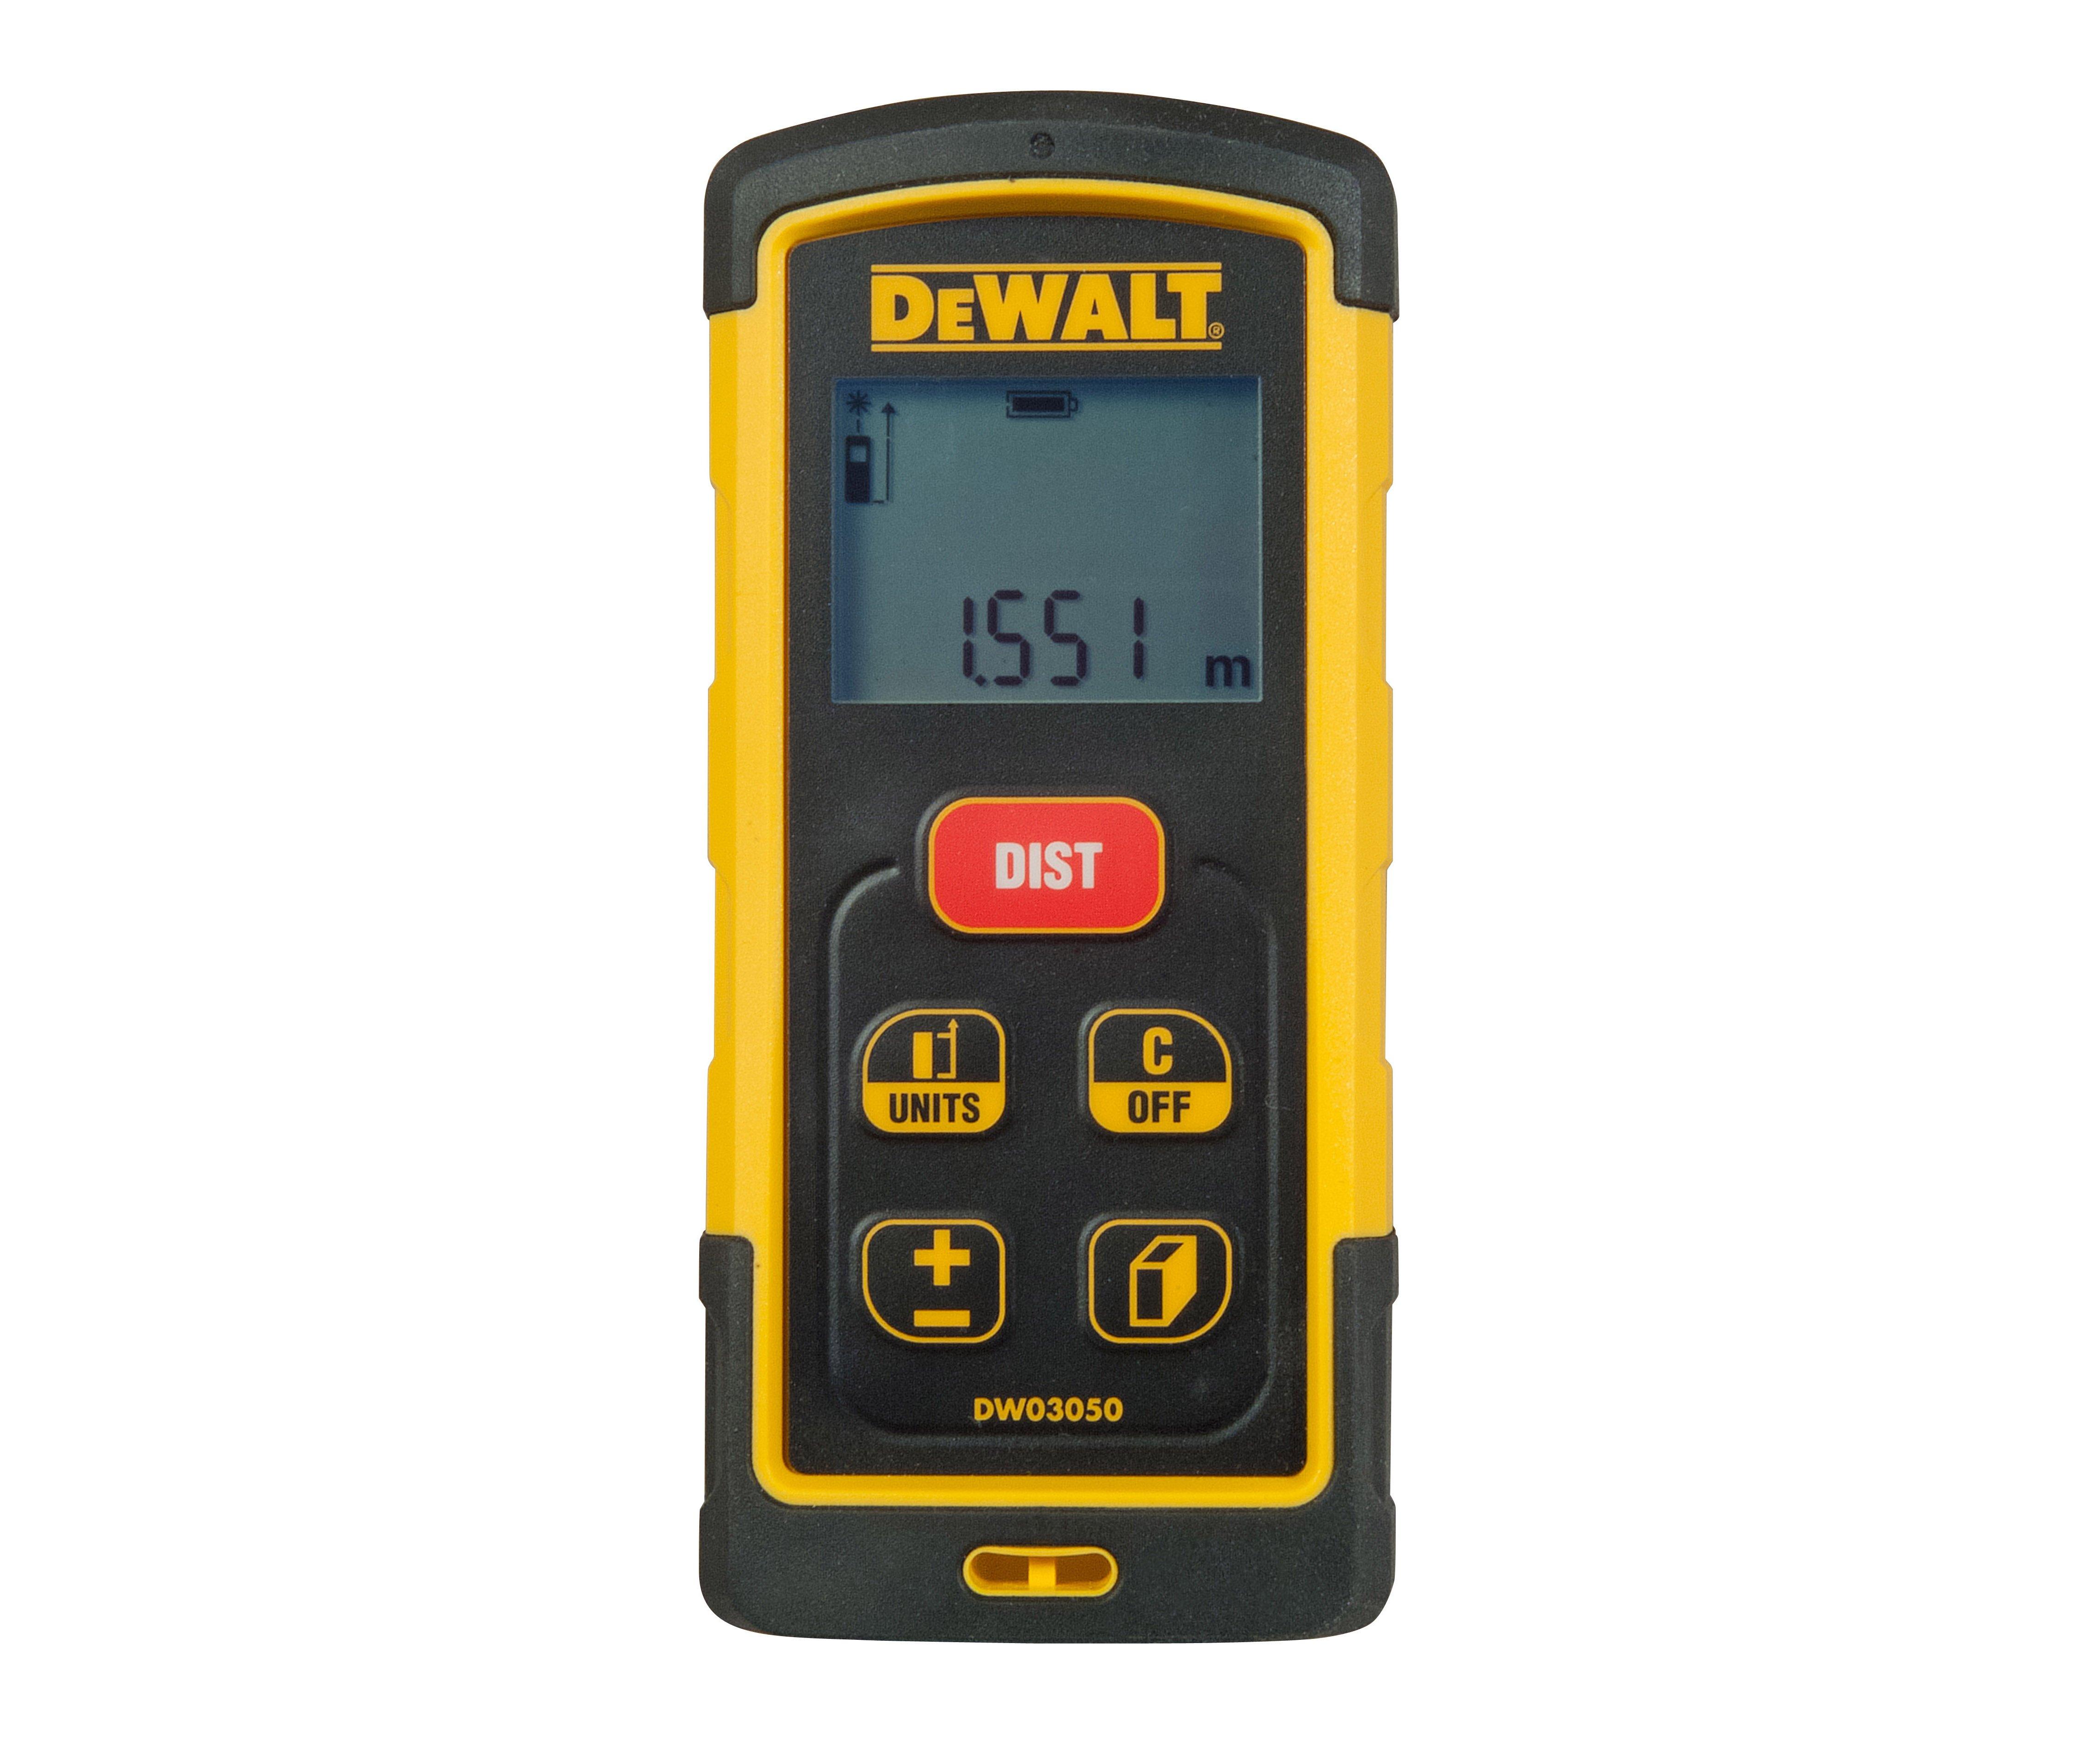 DeWALT DW03050 laserový dálkoměr 50m